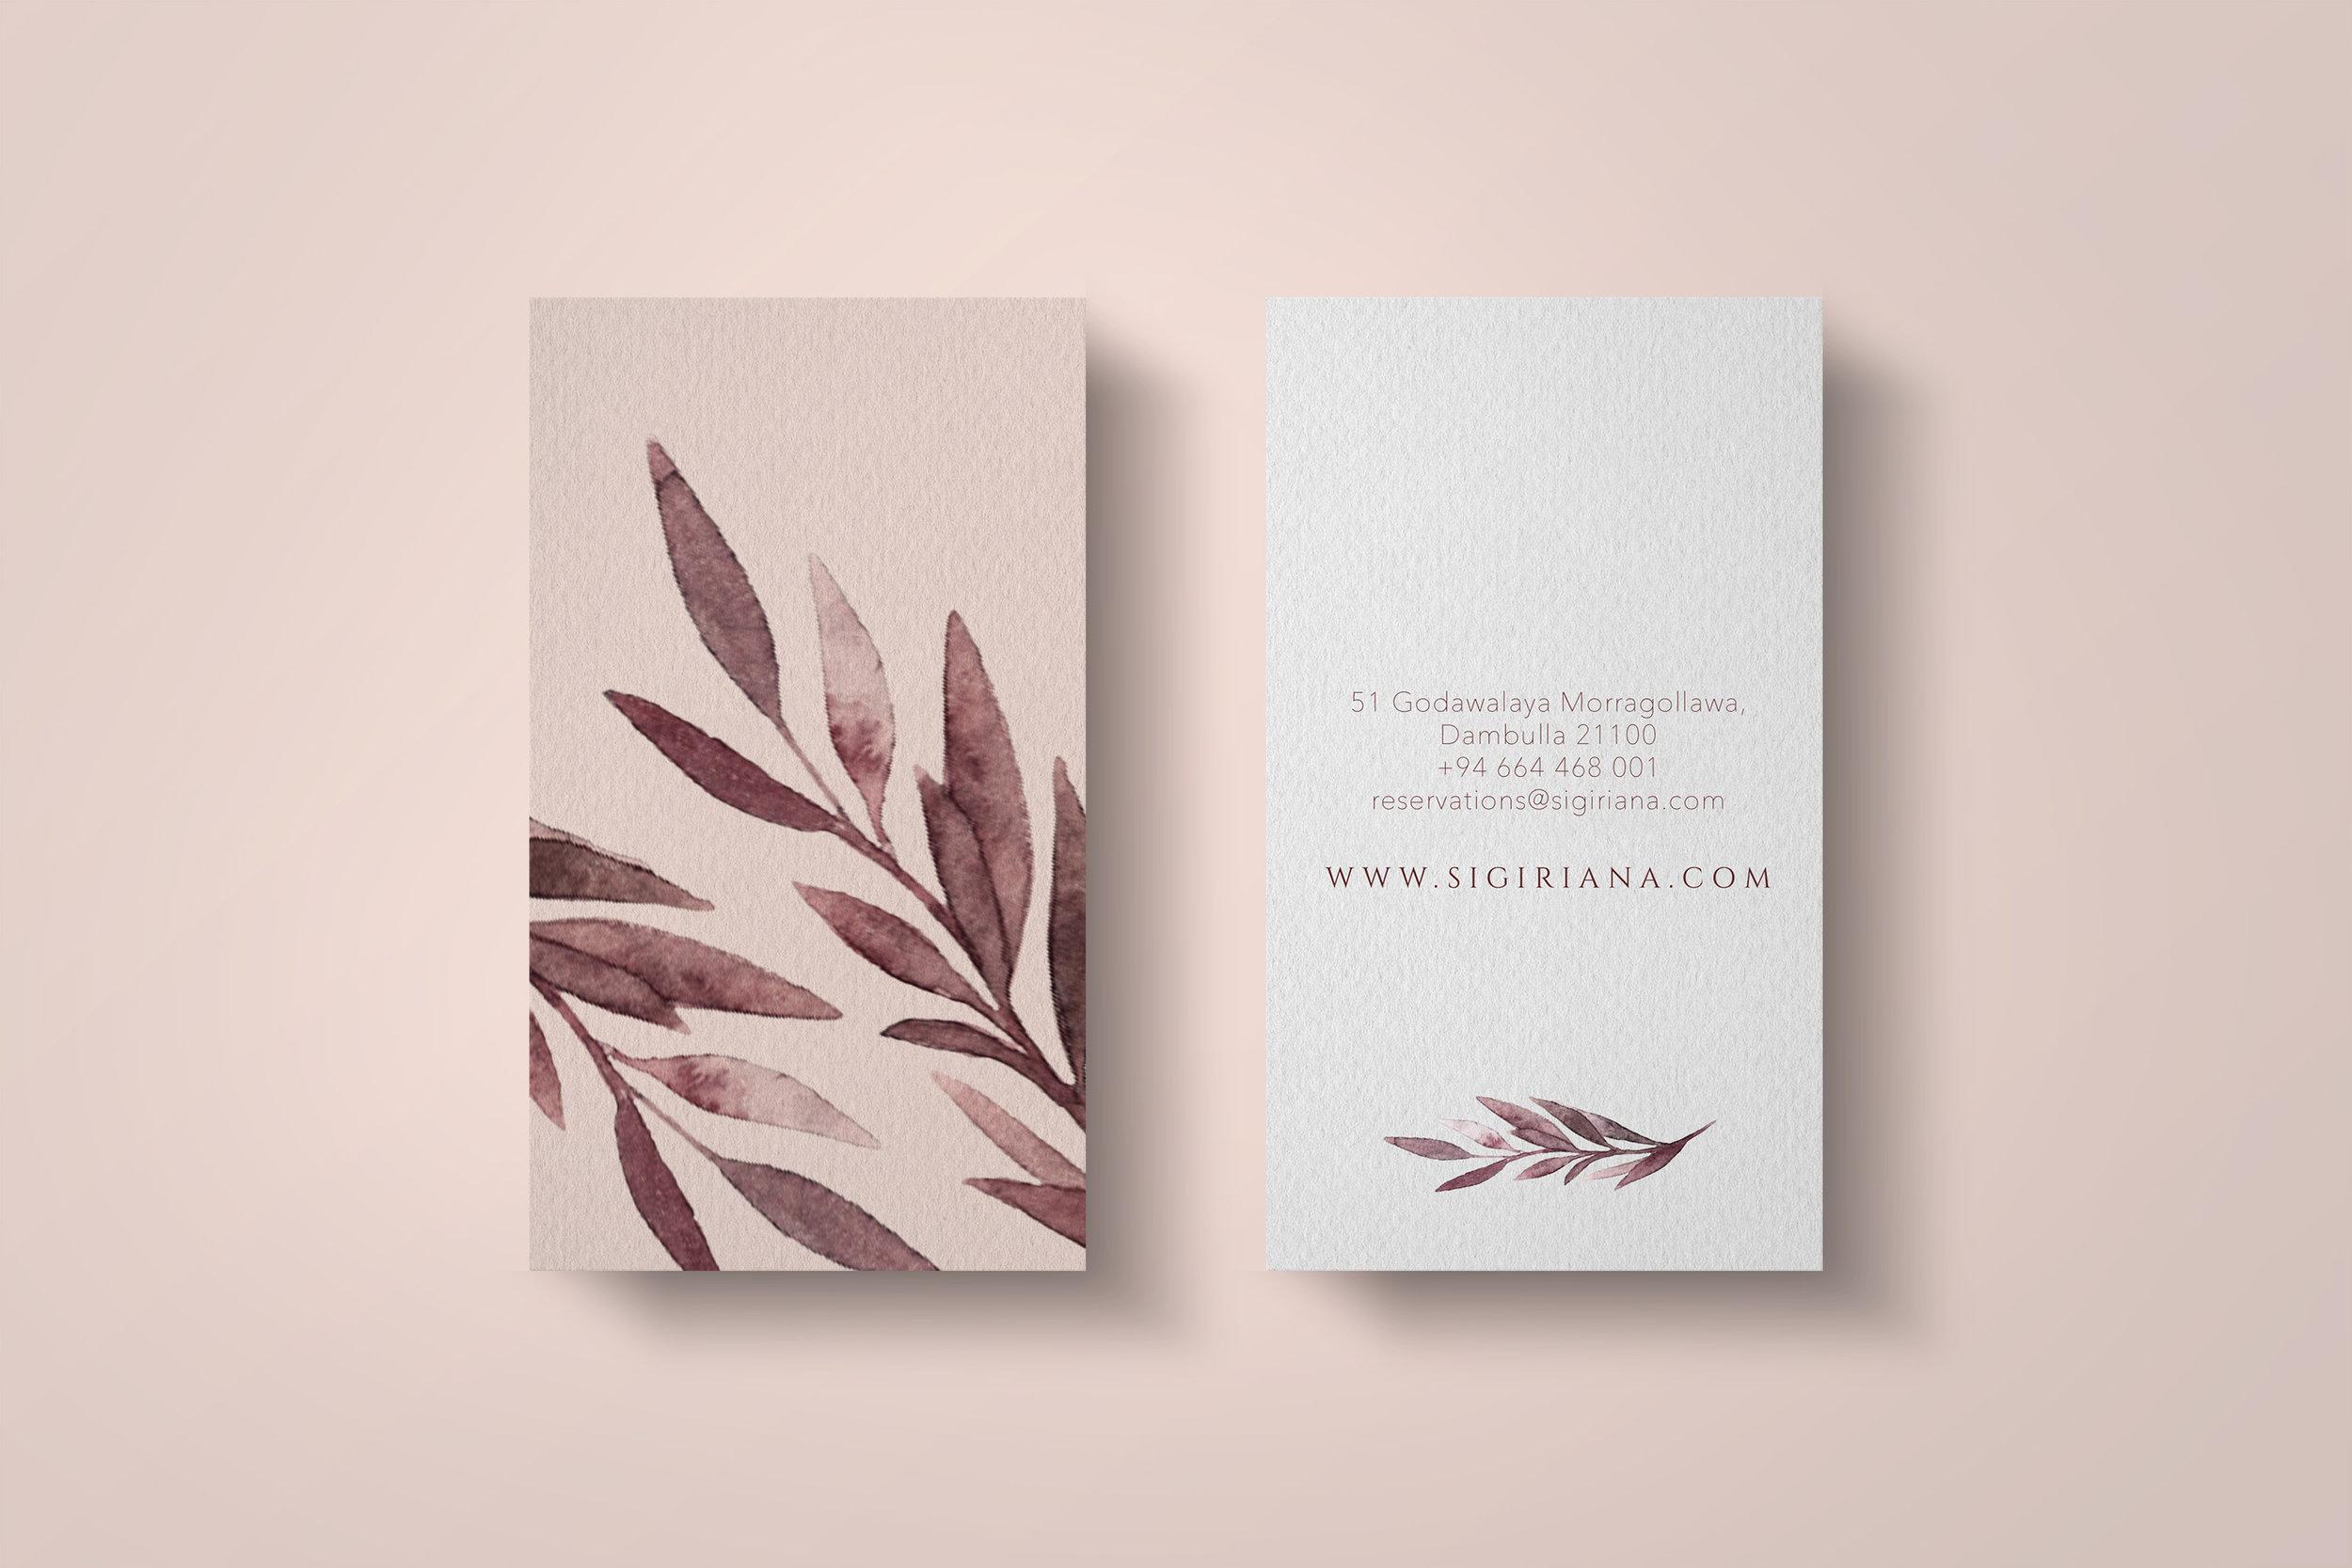 Sigiriana-Business-Cards-2.jpg